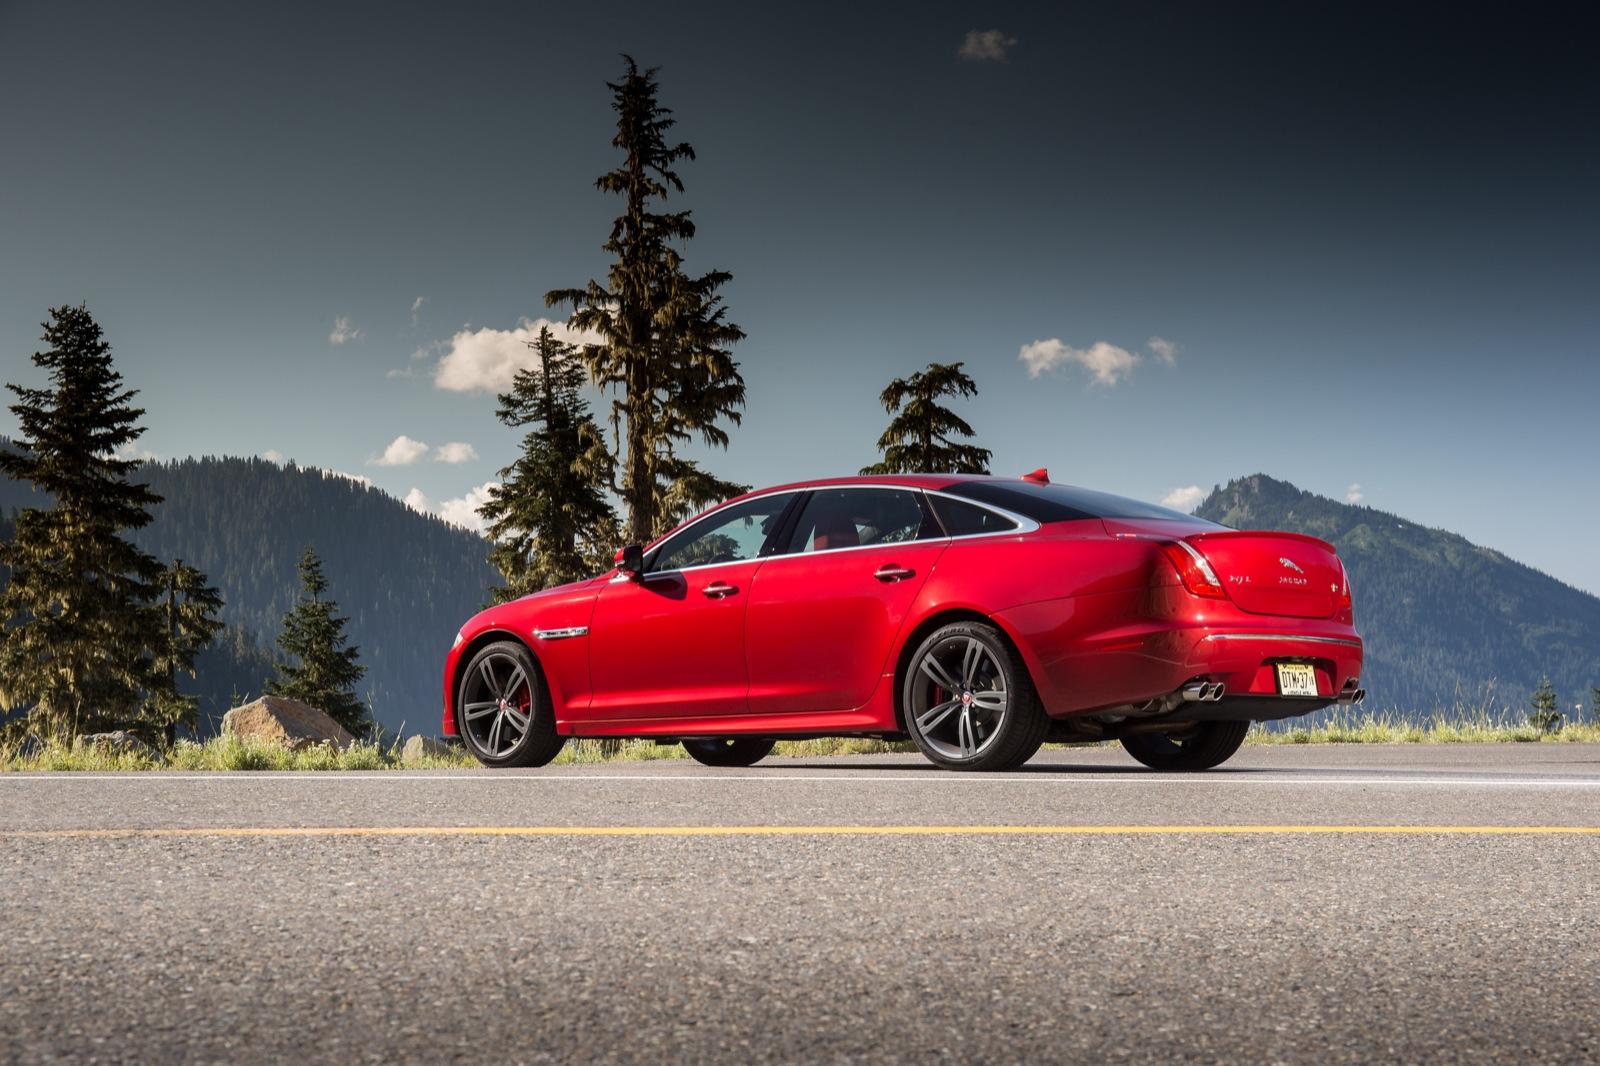 2014 Jaguar Xjr First Drive Review Page 2